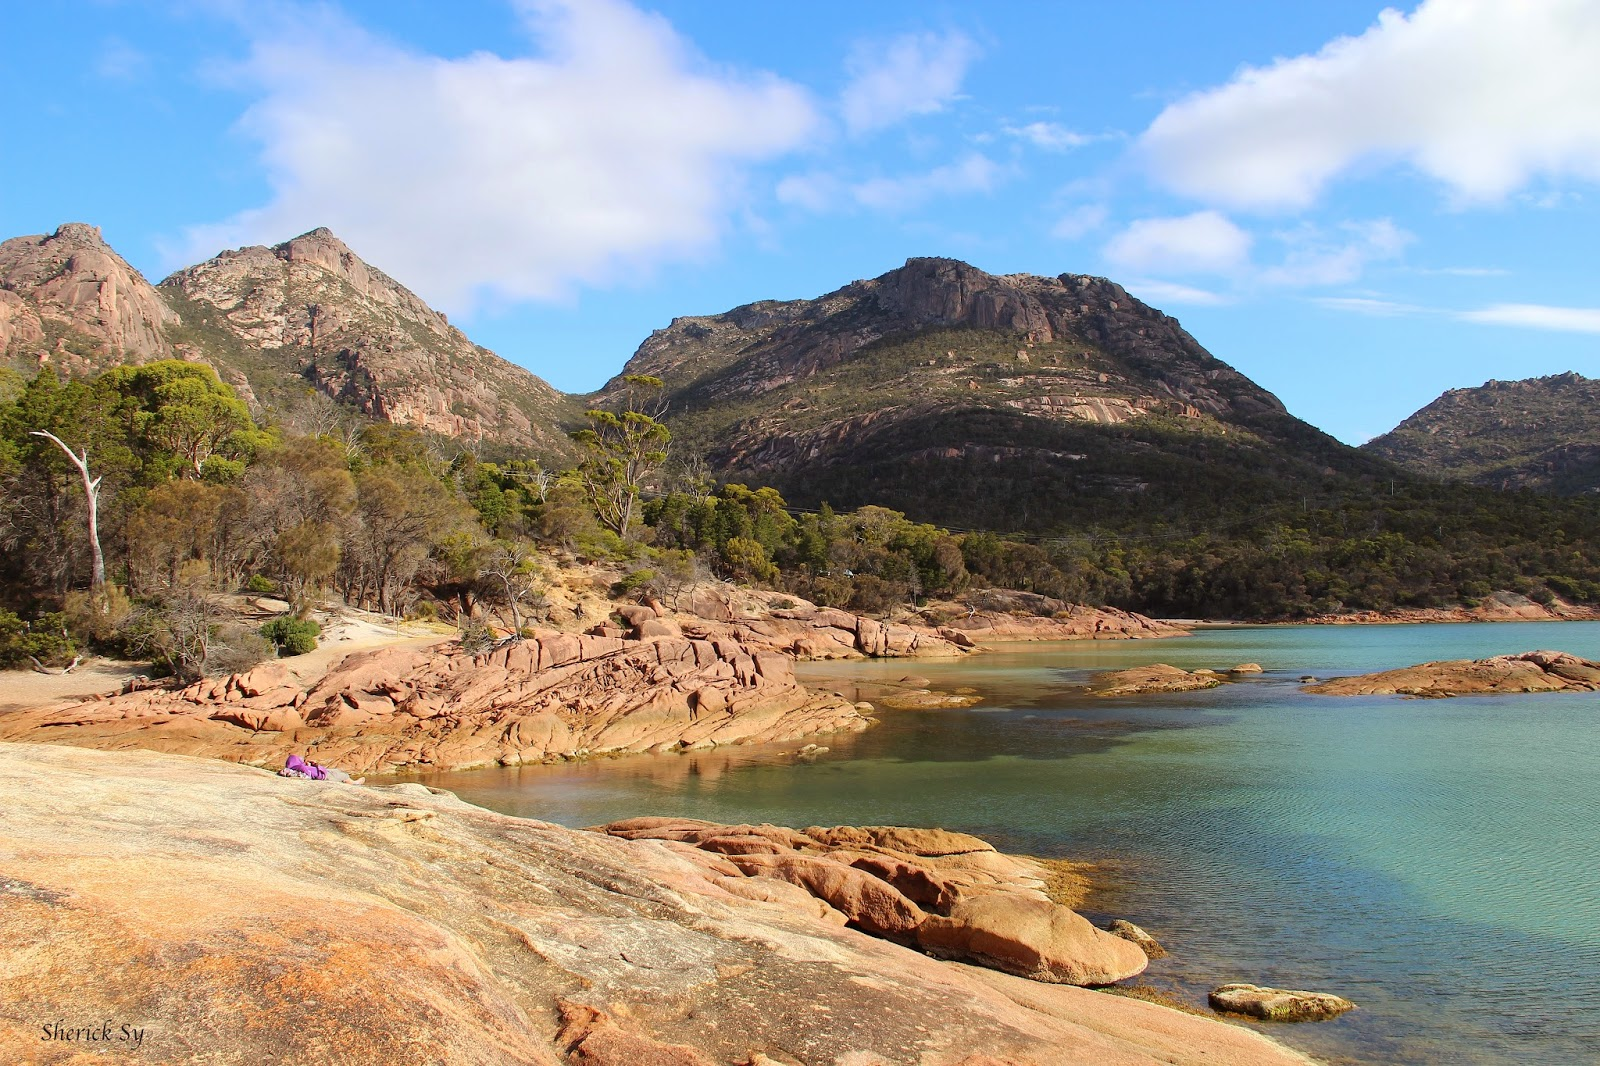 Honeymoon Bay, Freycinet National Park, Tasmania